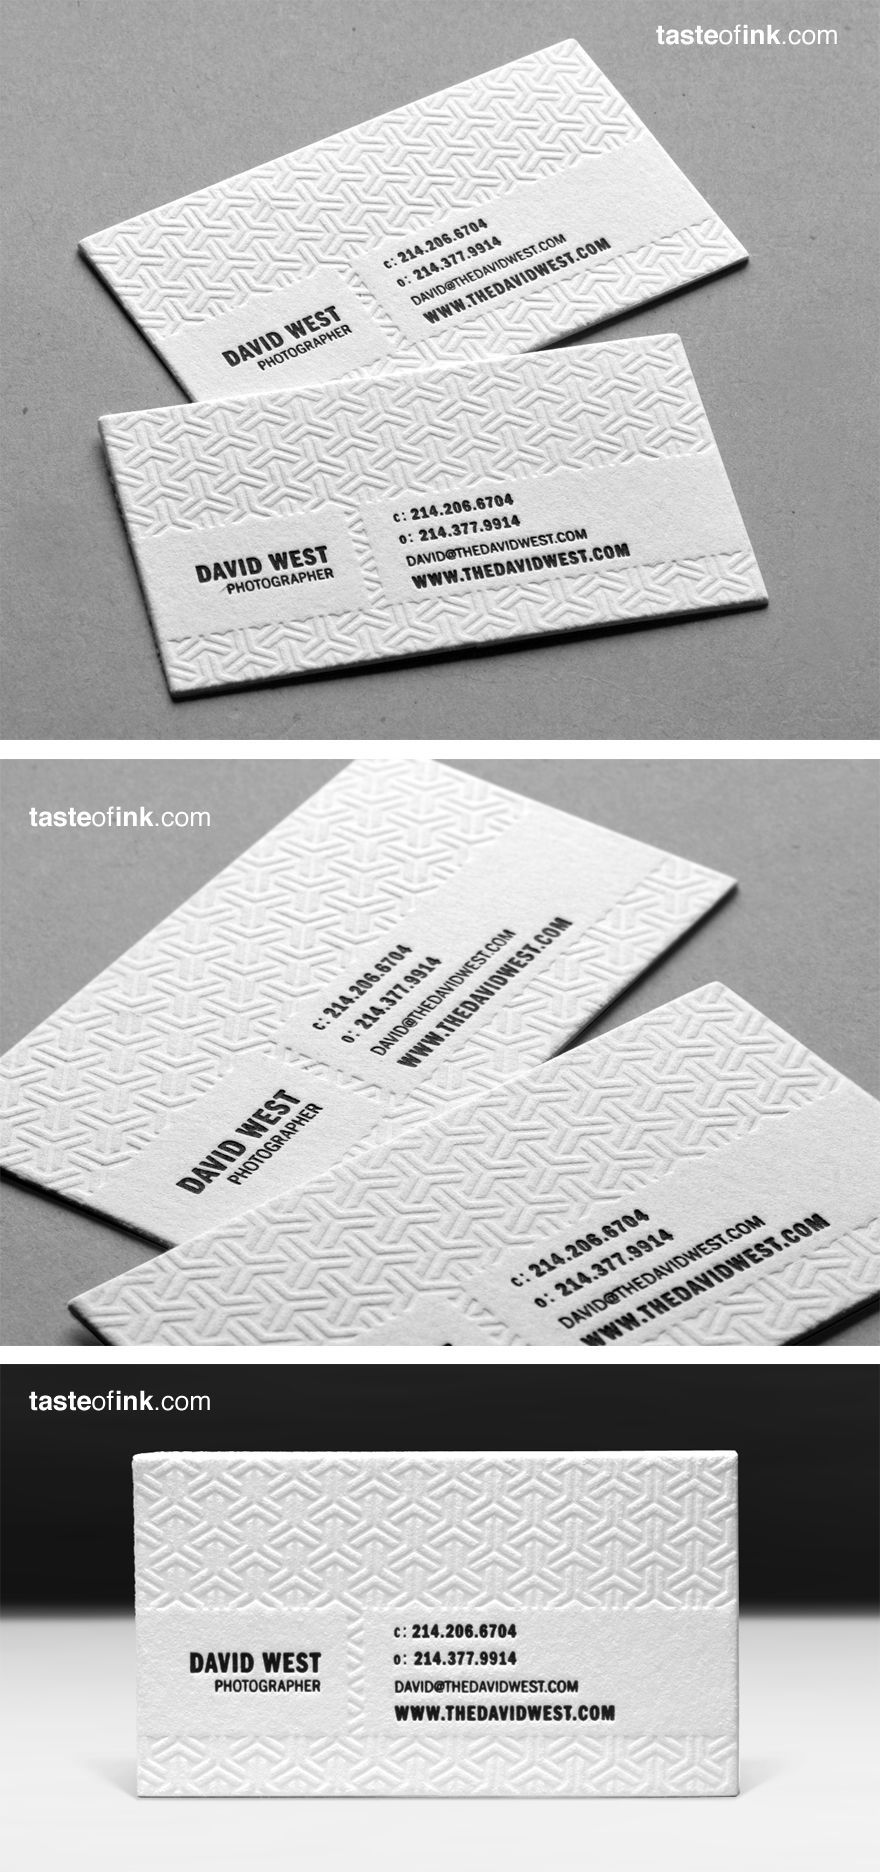 Taste of Ink - David West photography | Graphic Design | Pinterest ...